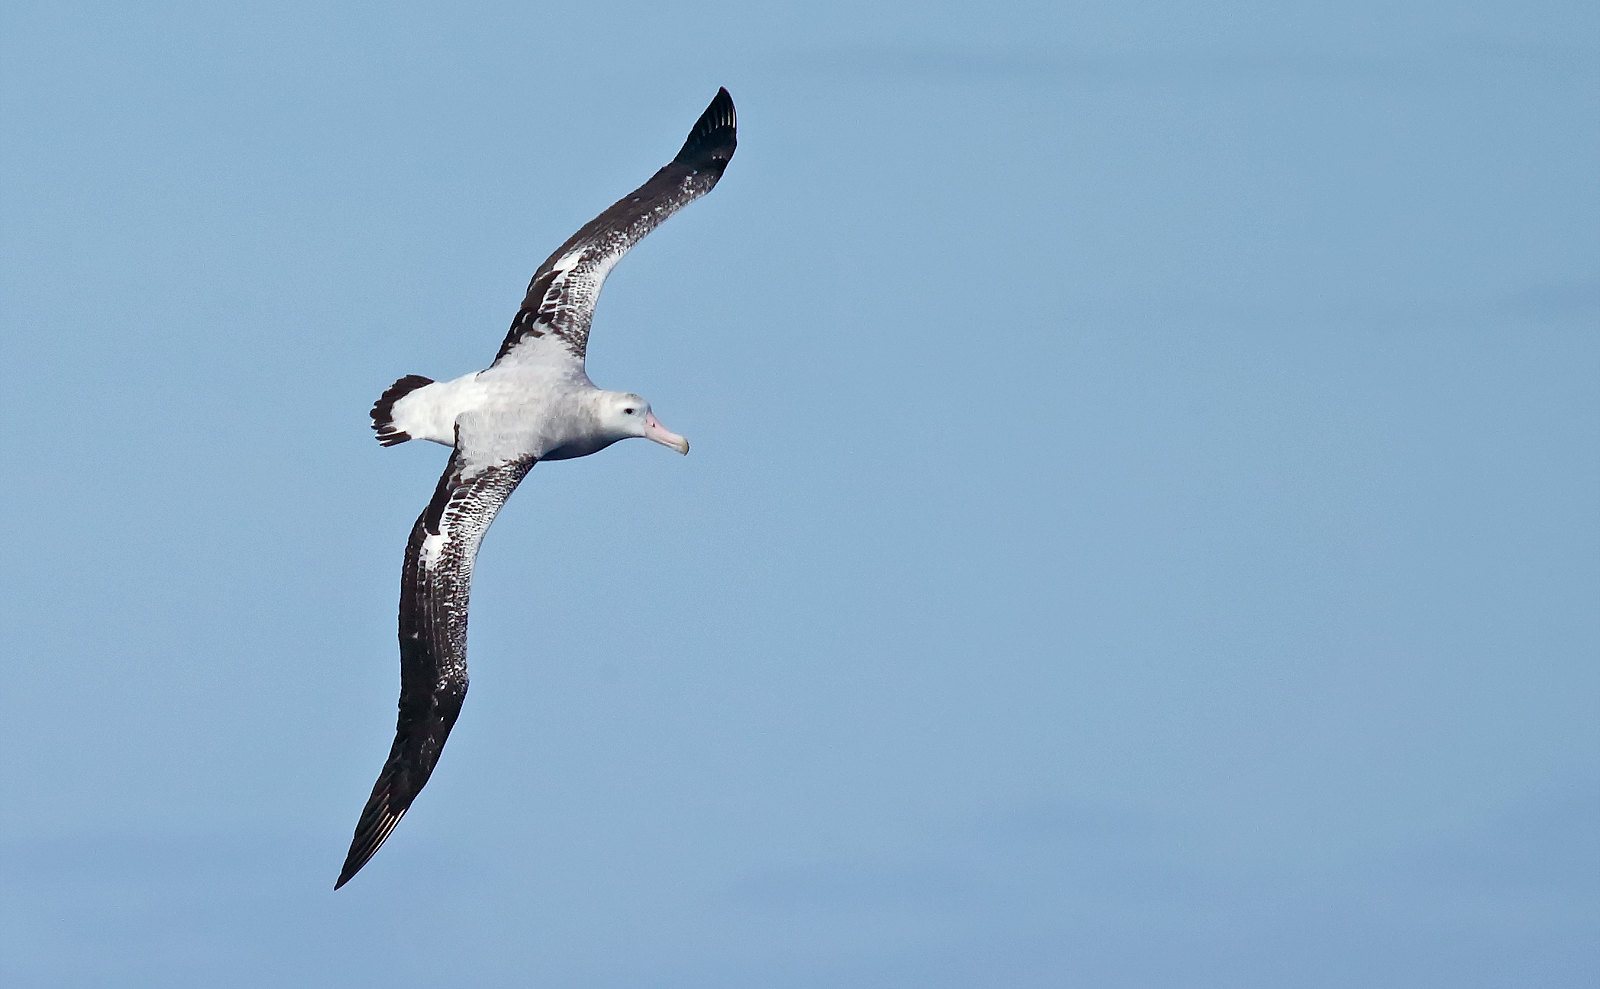 Probable Gough Wandering Albatross